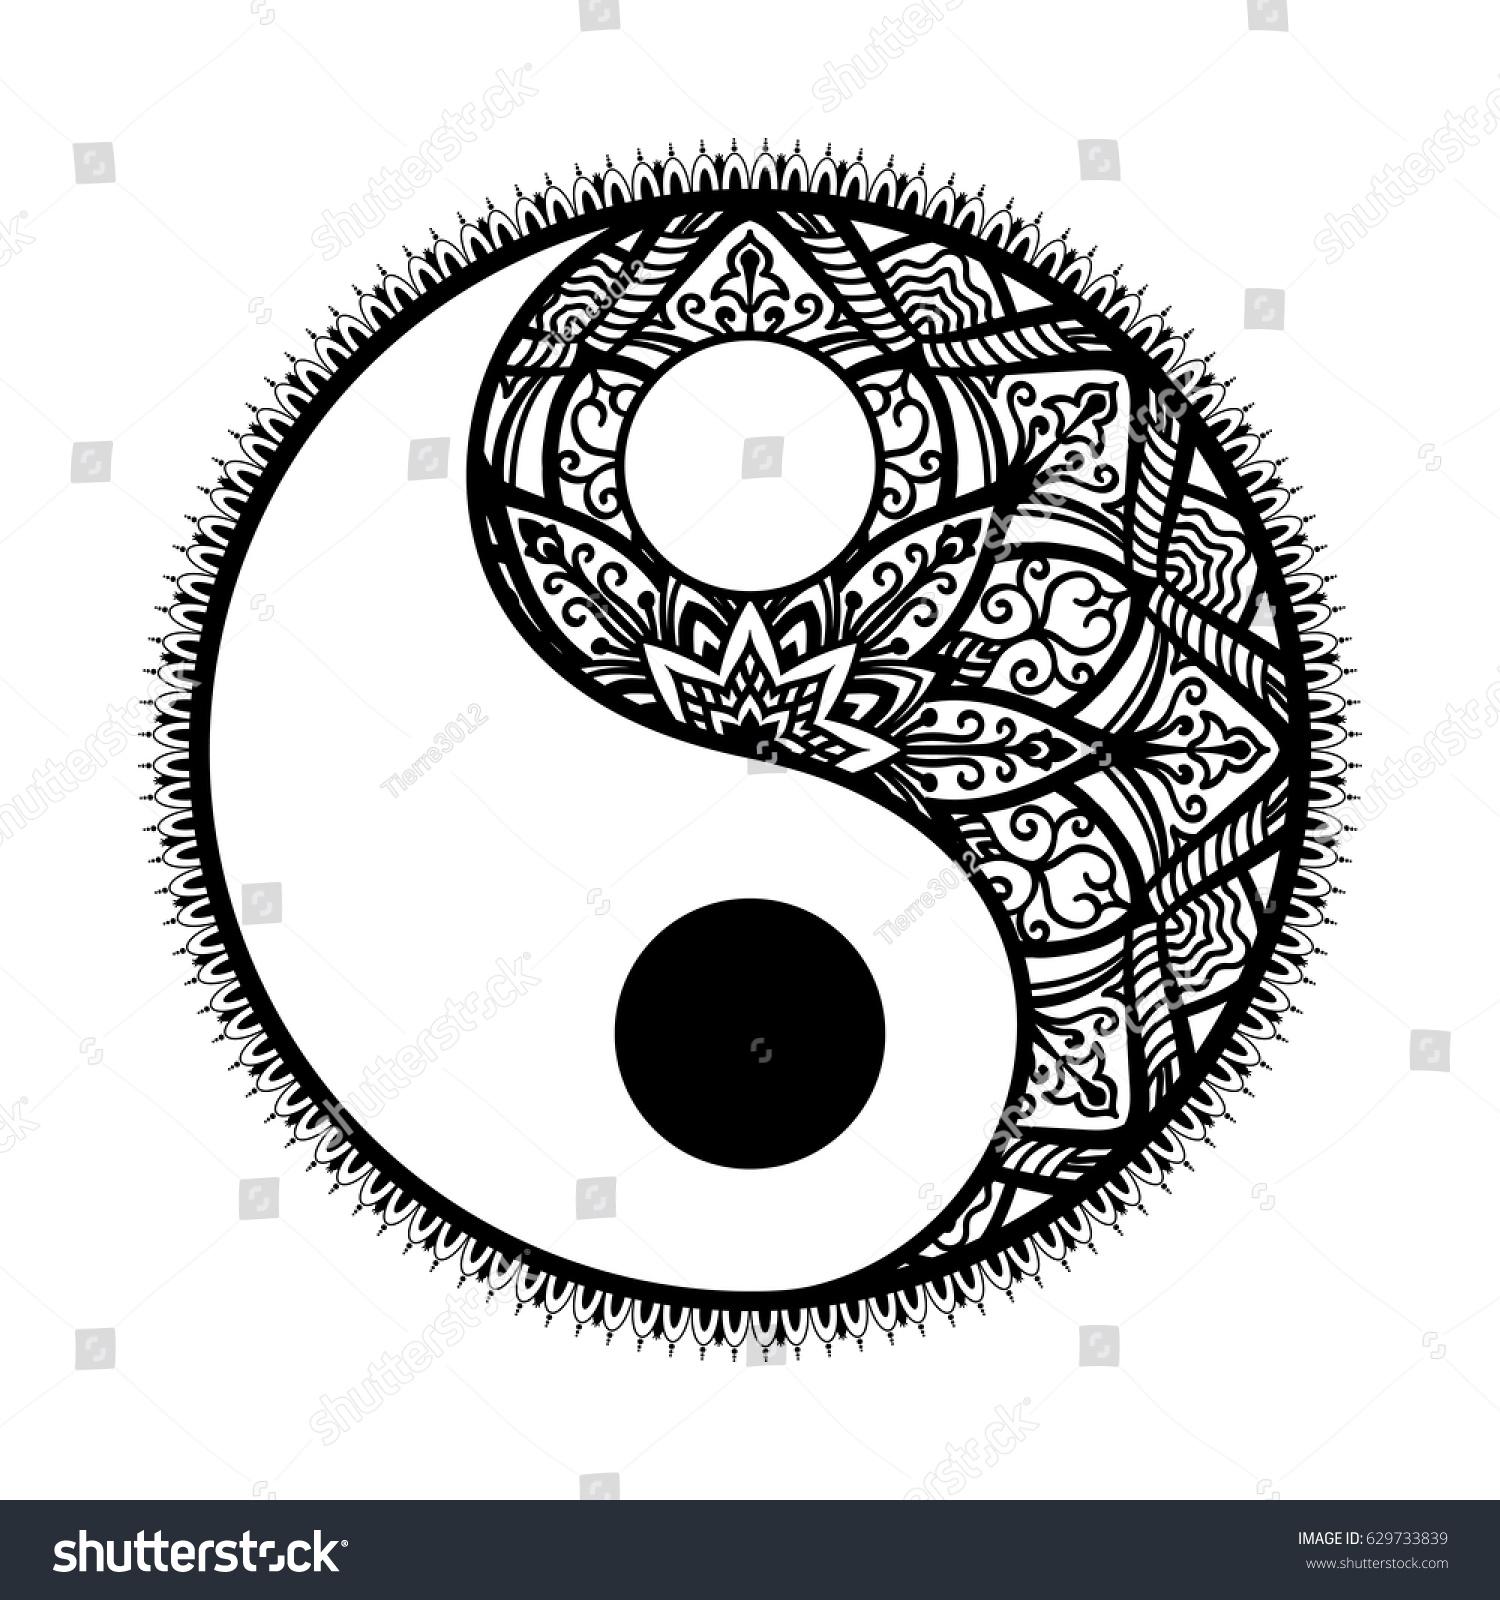 Stylized yin yang tao mandala symbolmonochrome stock vector stylized yin and yang tao mandala symbolnochrome round ornament pattern paisley background buycottarizona Images